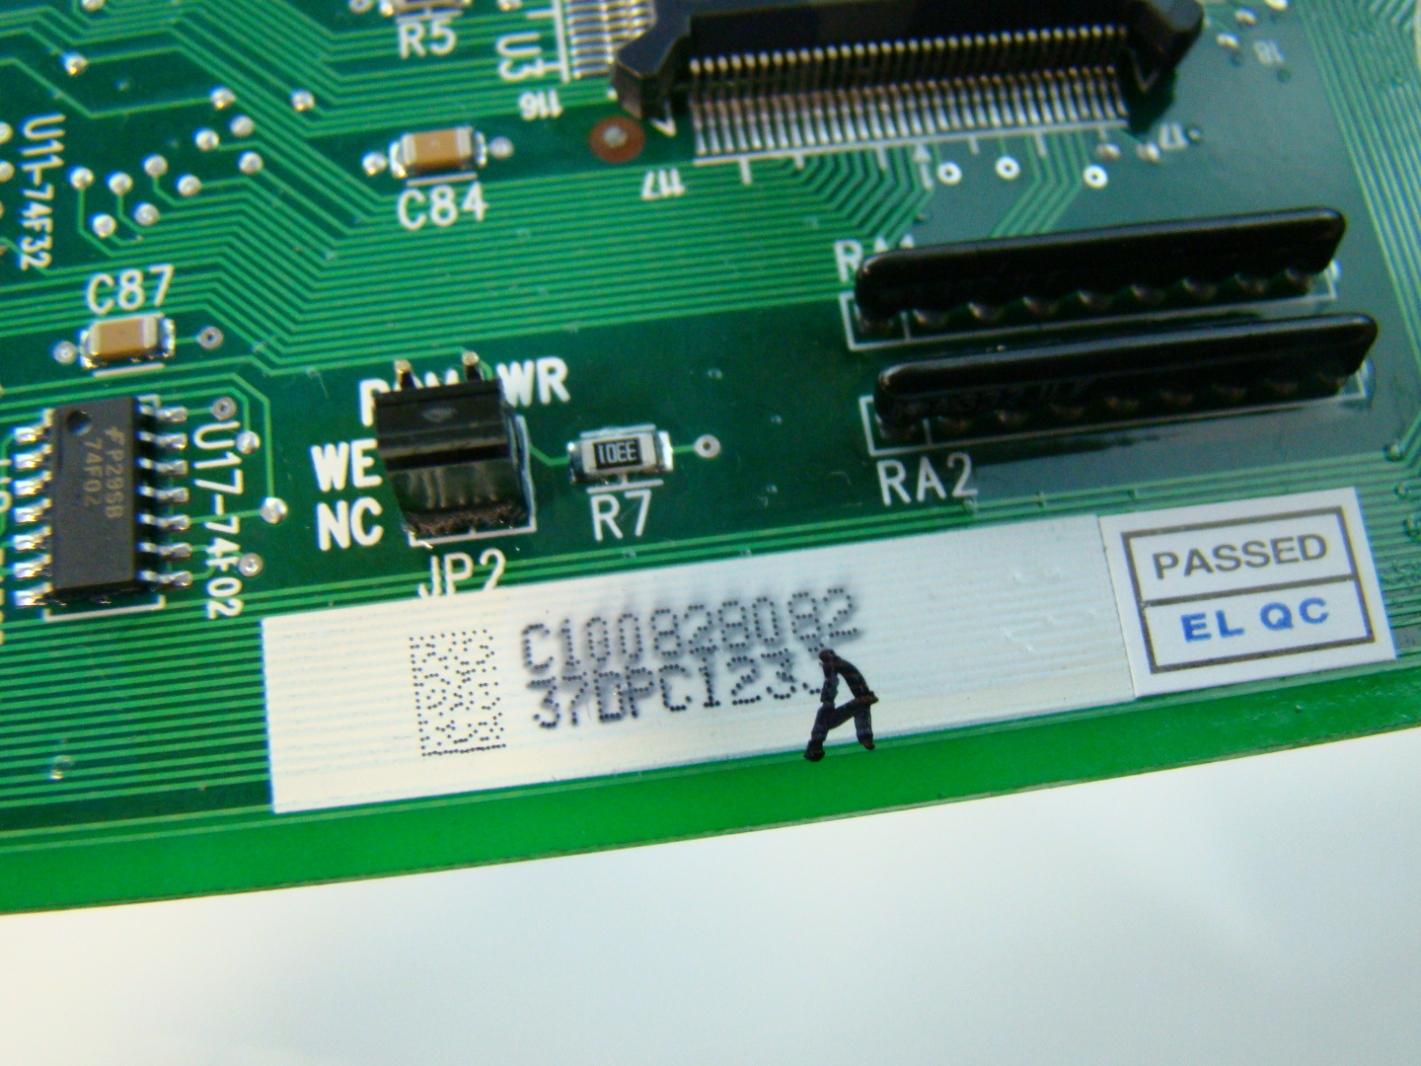 Details about LG Otis Elevator PC Board DPC 123 AEG14C637 #0F793E